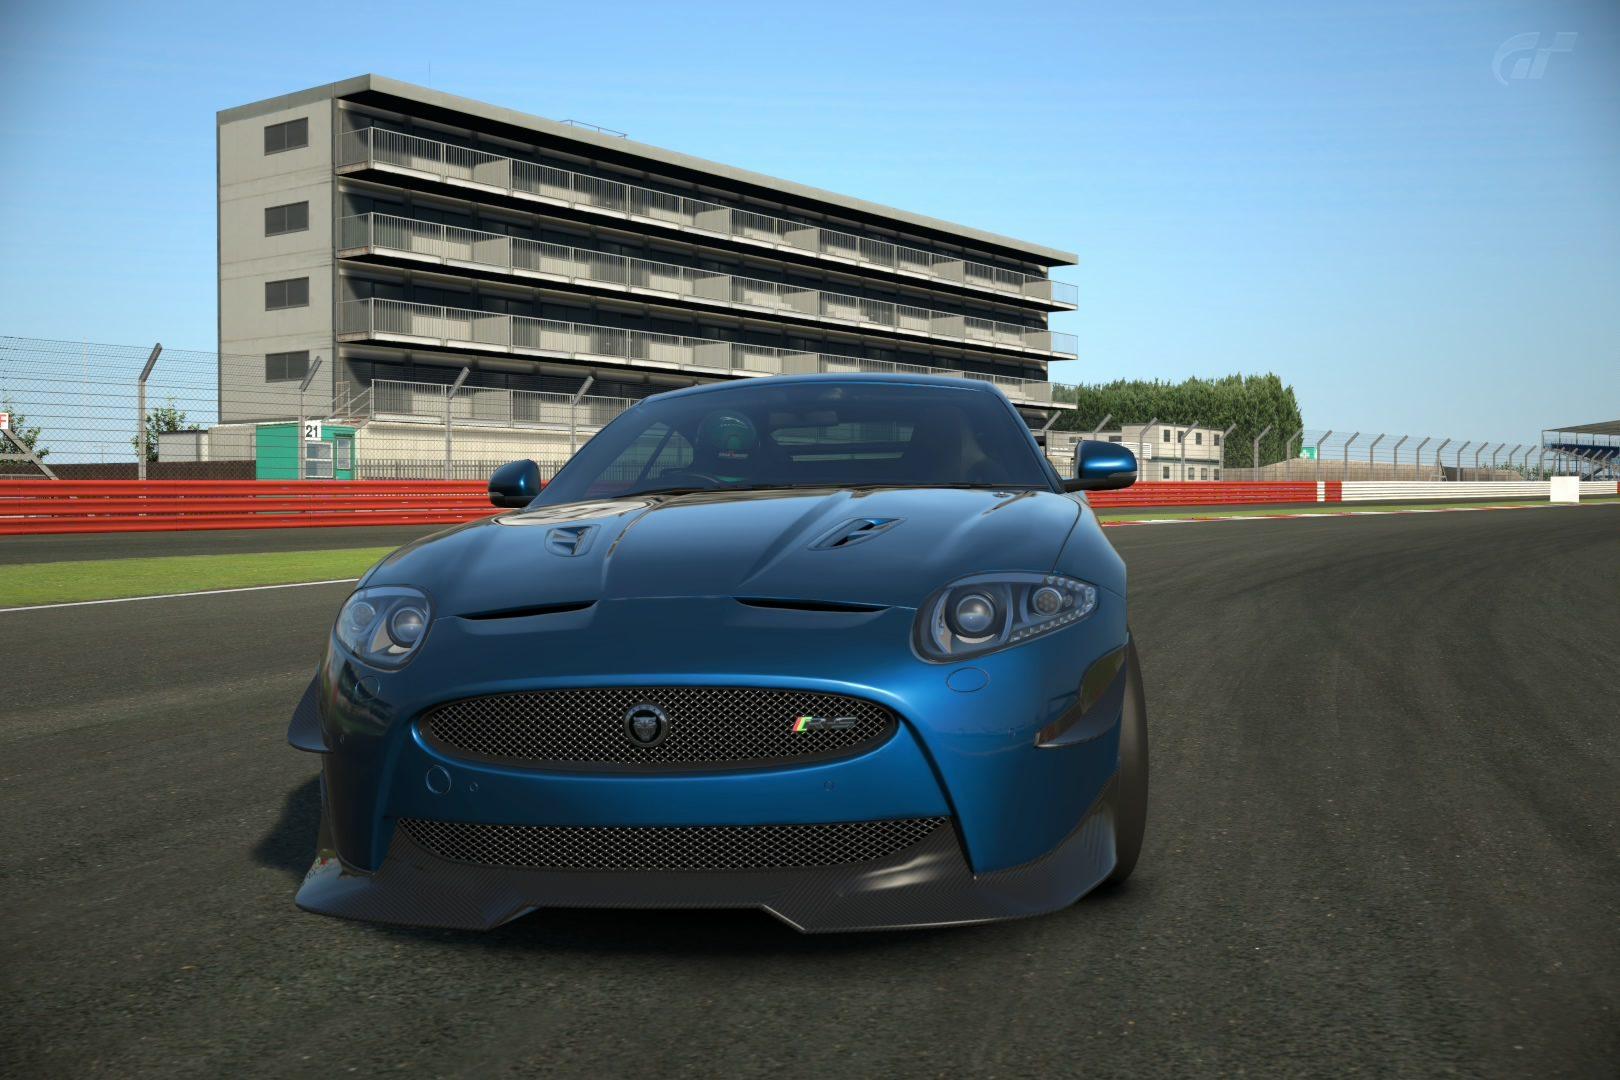 Silverstone Grand Prix Circuit_2.jpg